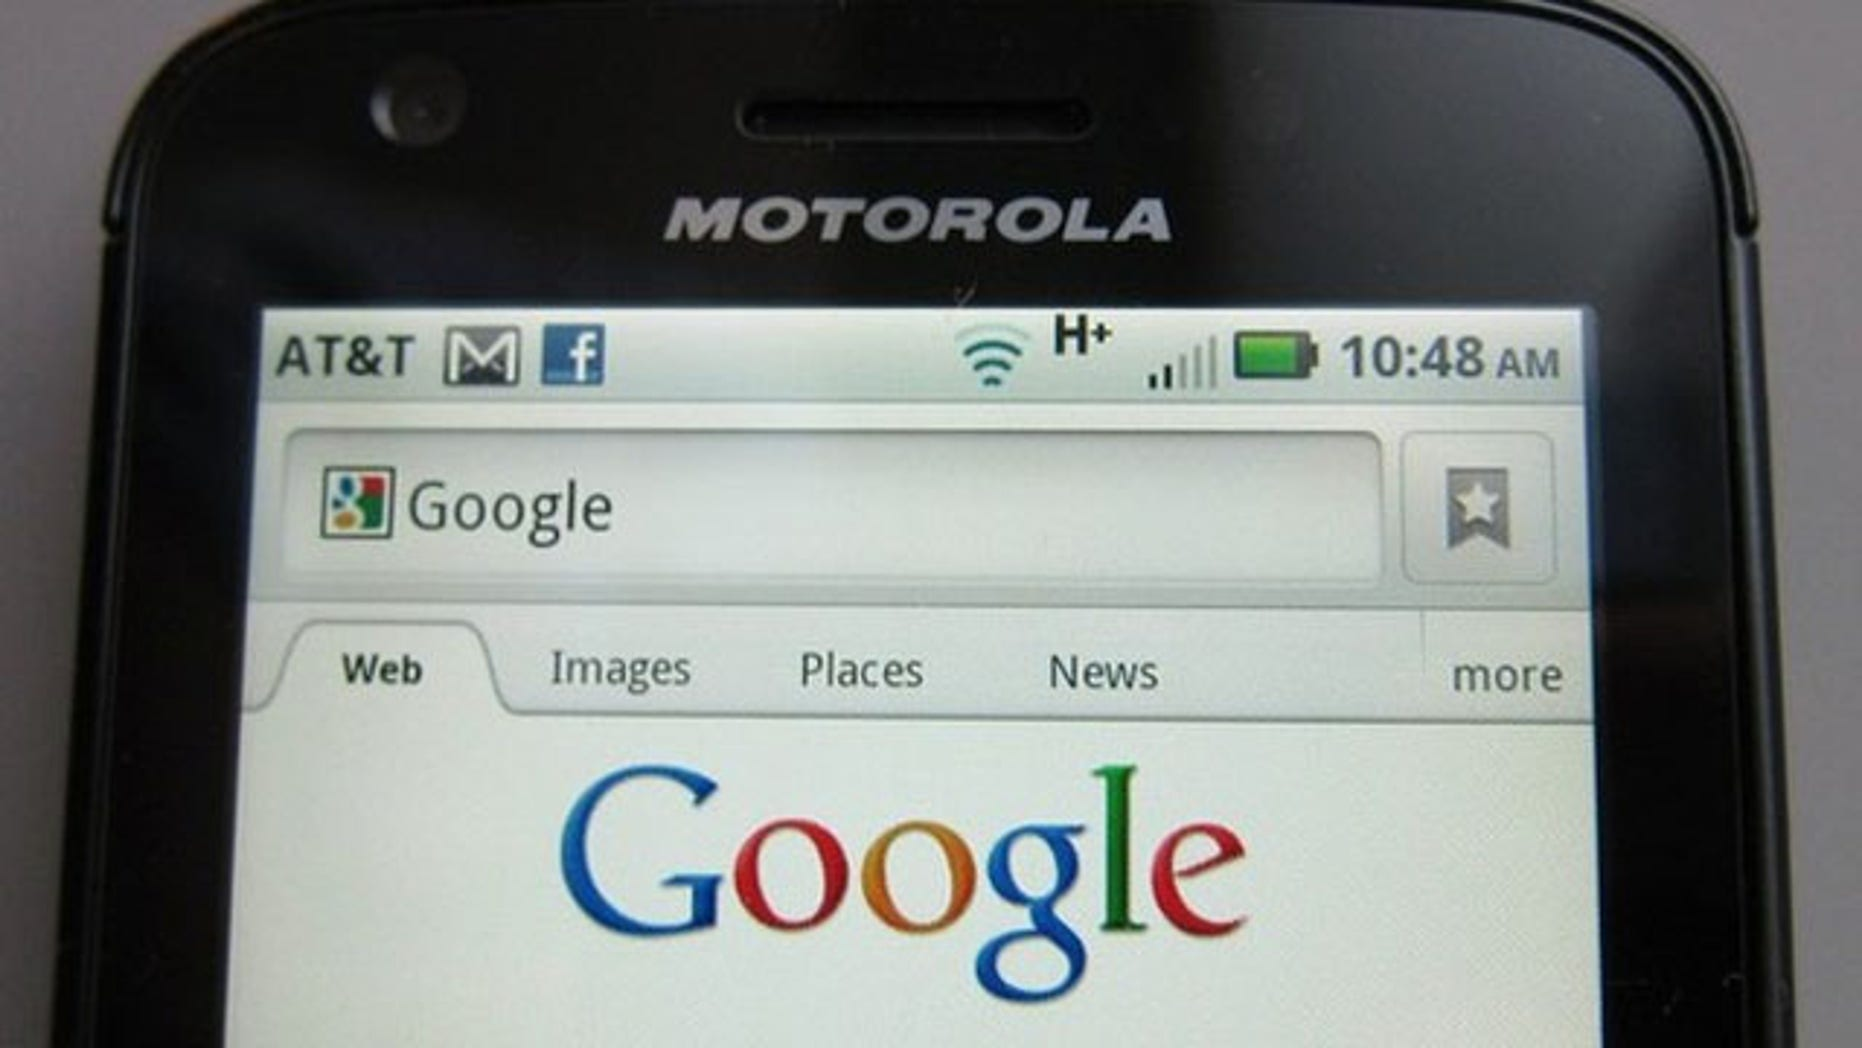 Microsoft believes Google and Motorola aren't playing fair.